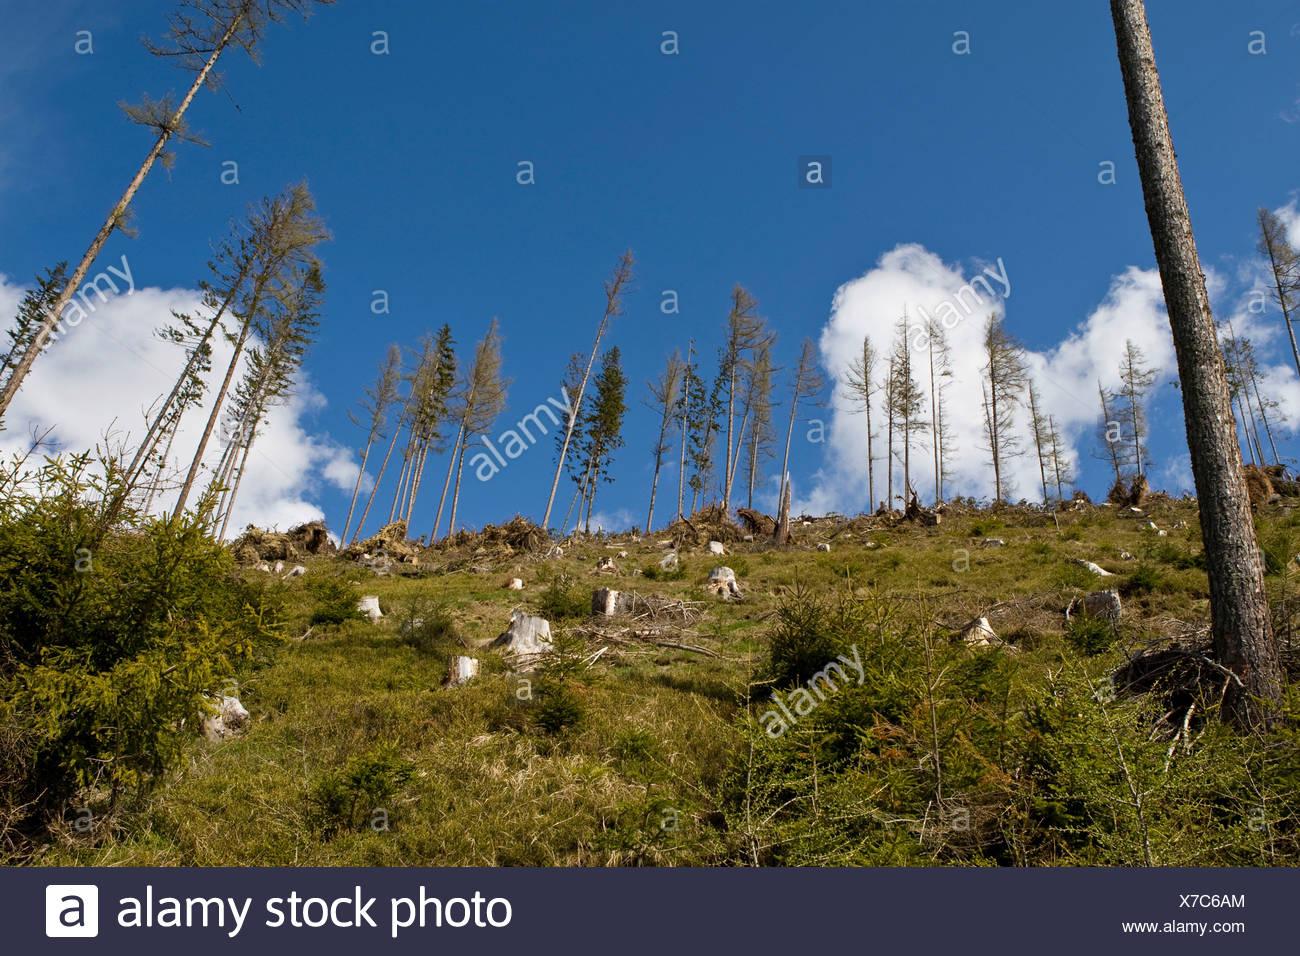 Tree stumps on a mountain slope, storm damage, Styria, Austria, Europe - Stock Image